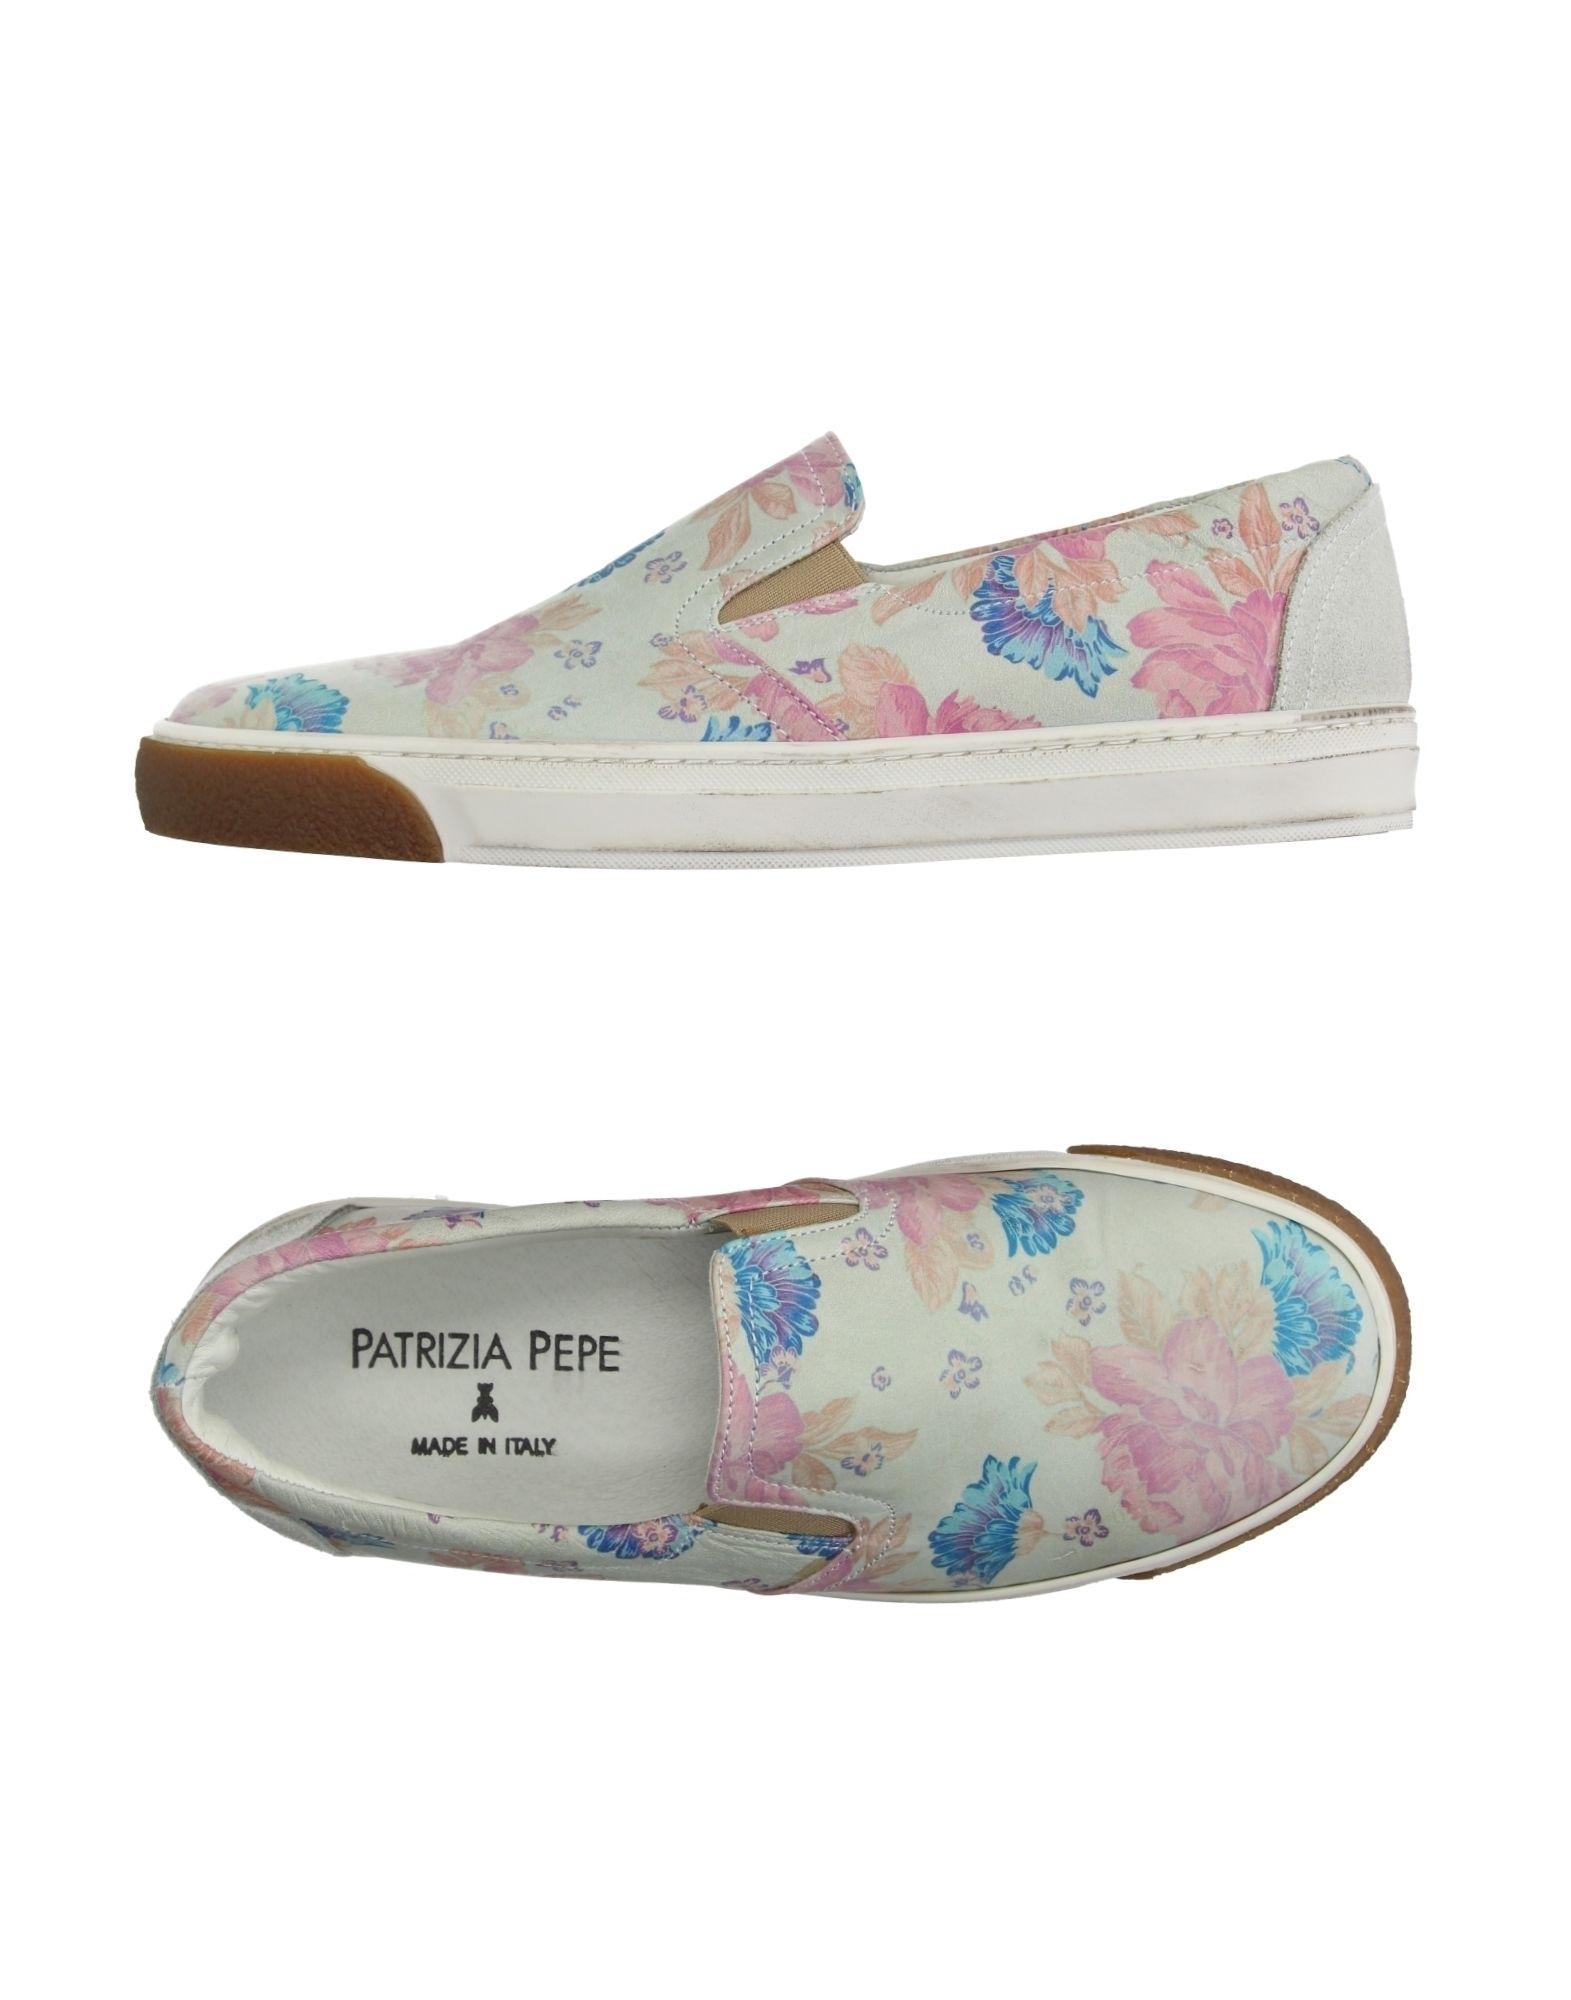 Patrizia Pepe Sneakers Damen    11173314EU Gute Qualität beliebte Schuhe 1c05a9